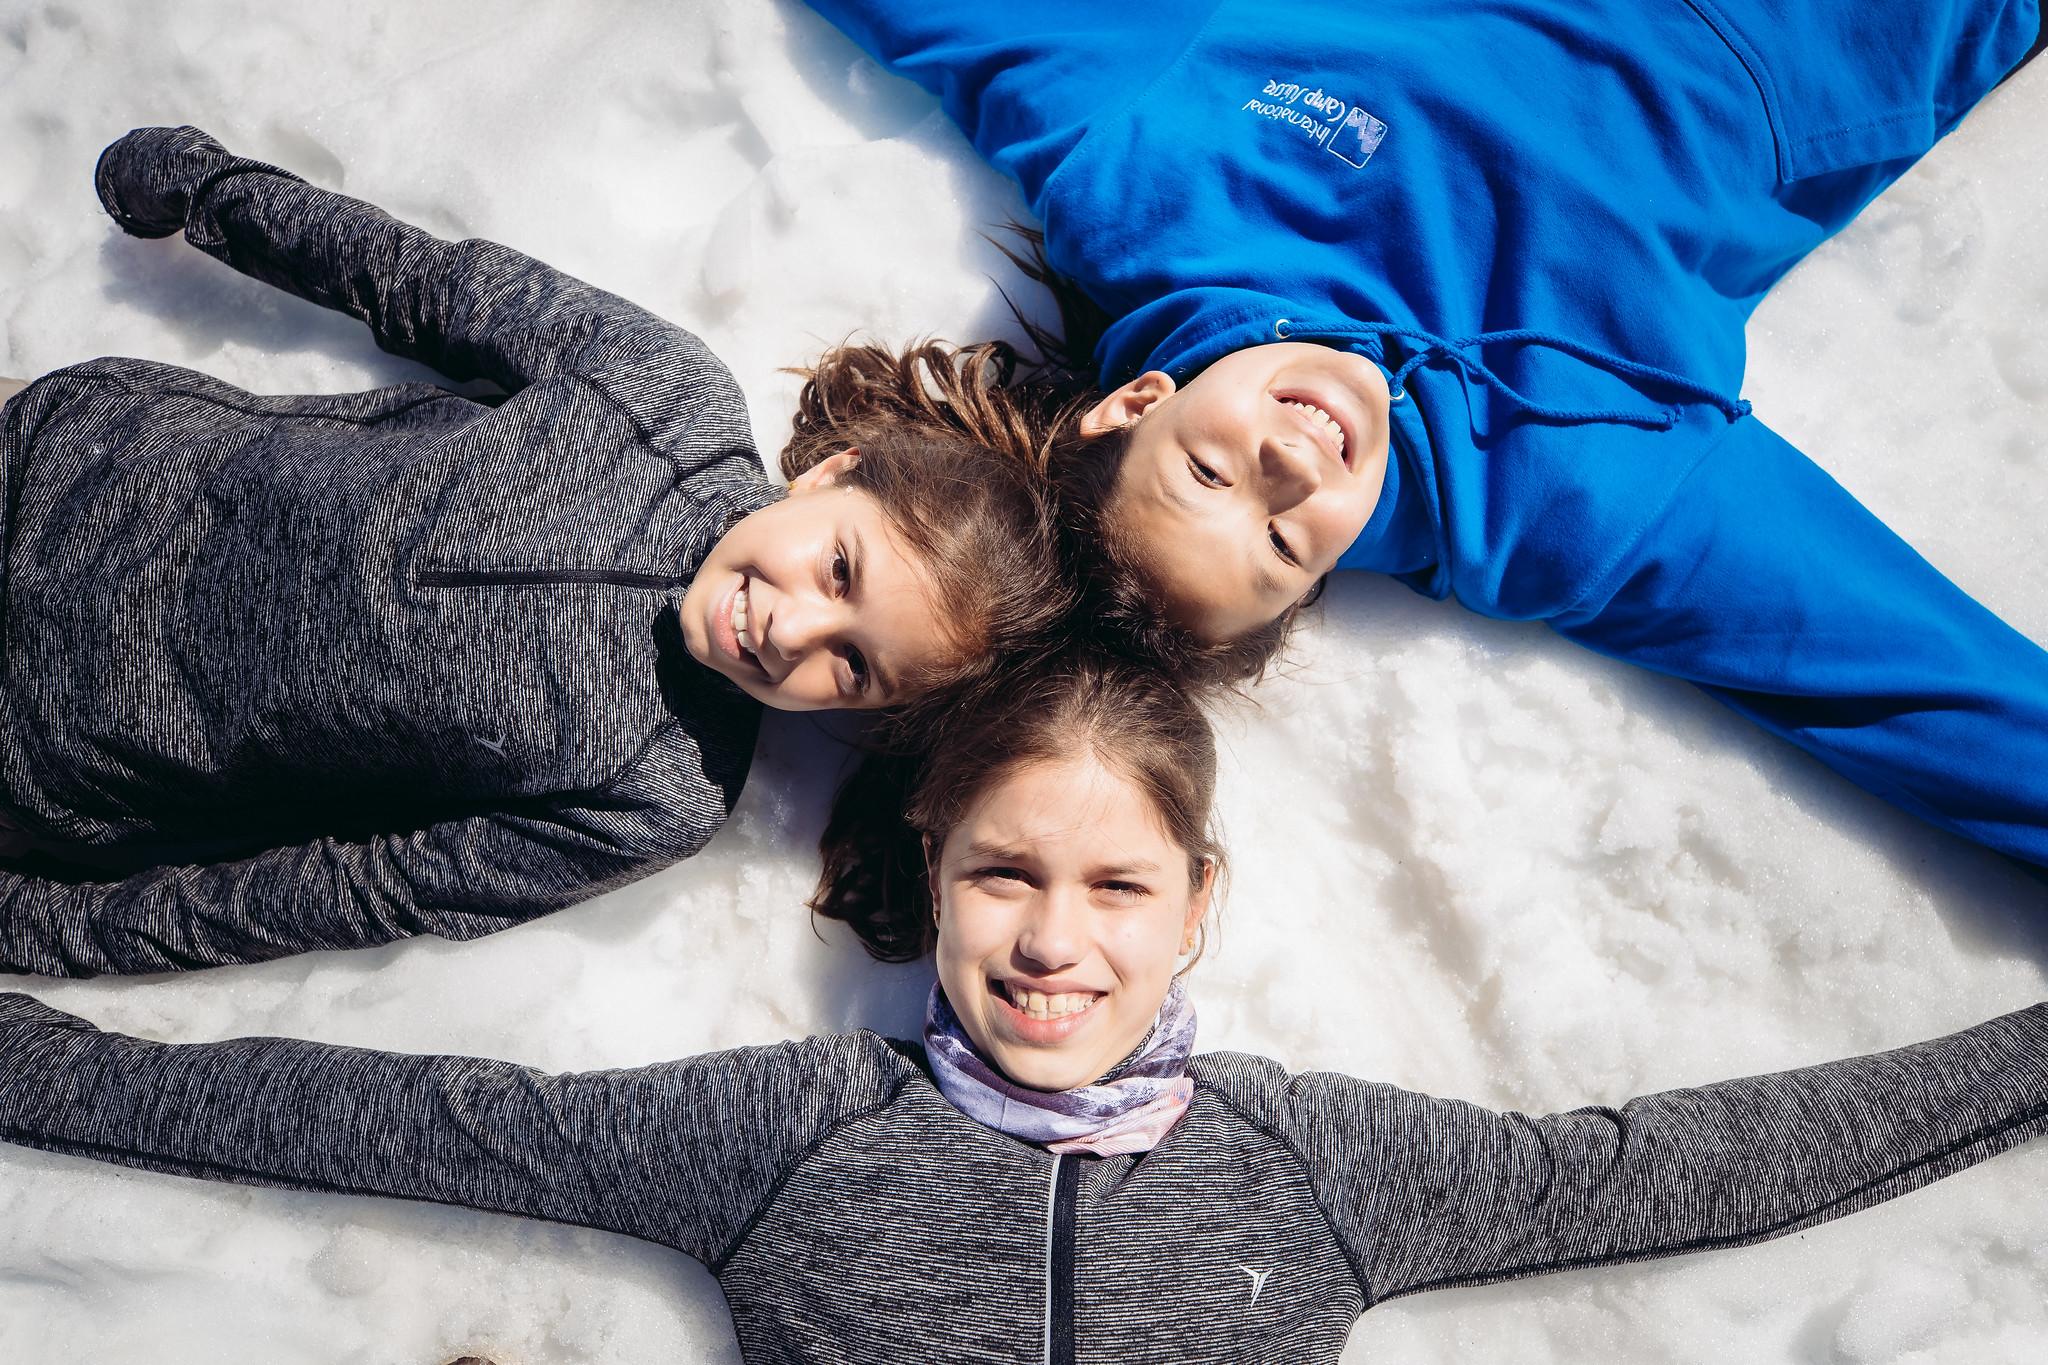 Friends on the glacier